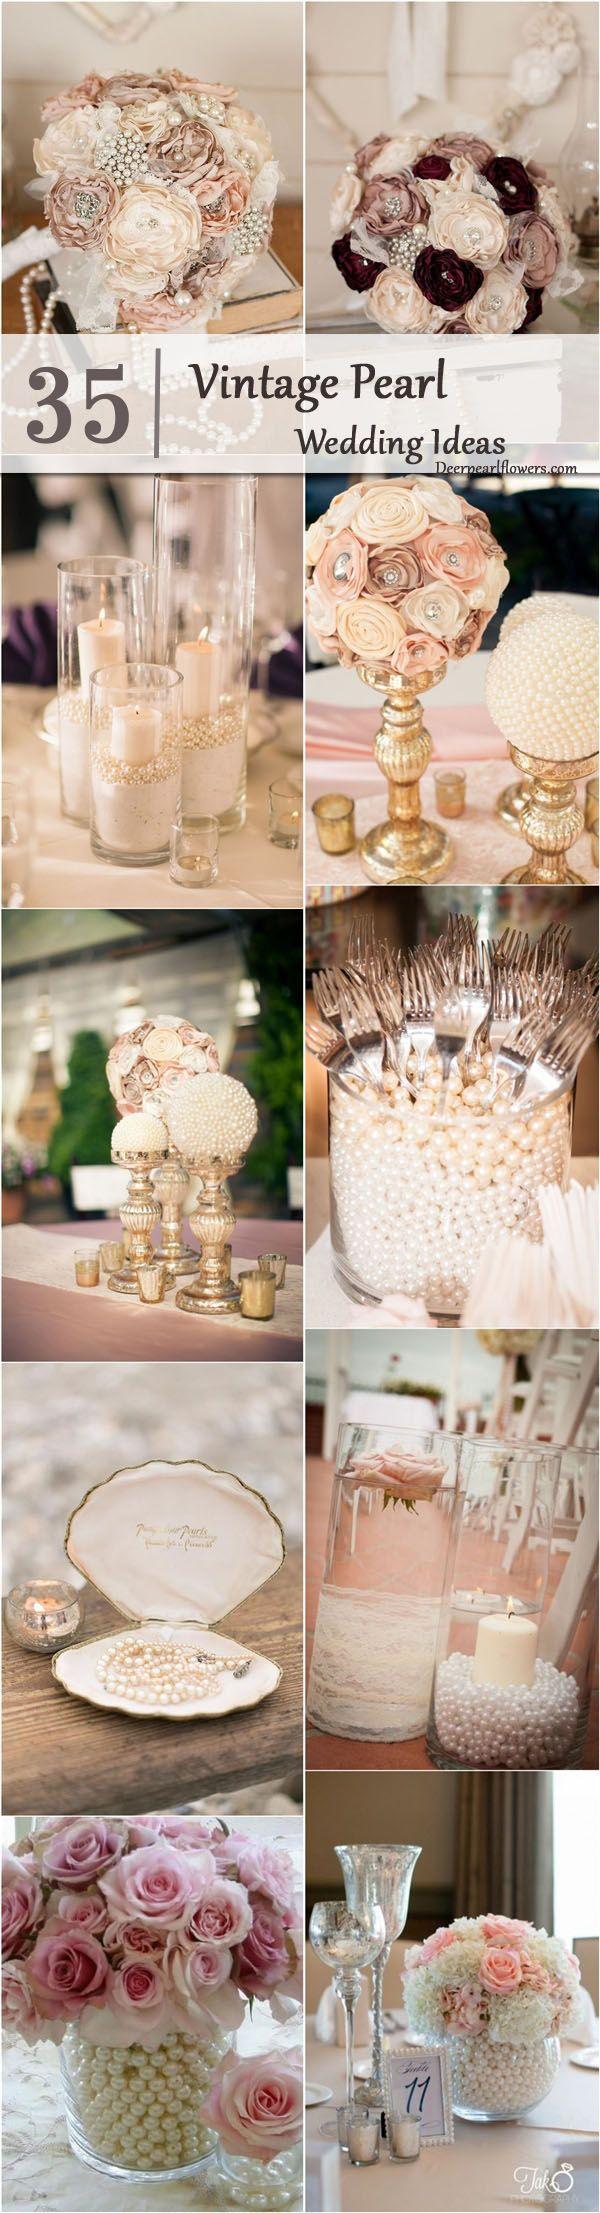 Vintage pearls wedding ideas and themes / http://www.deerpearlflowers.com/vintage-pearl-wedding-ideas/2/